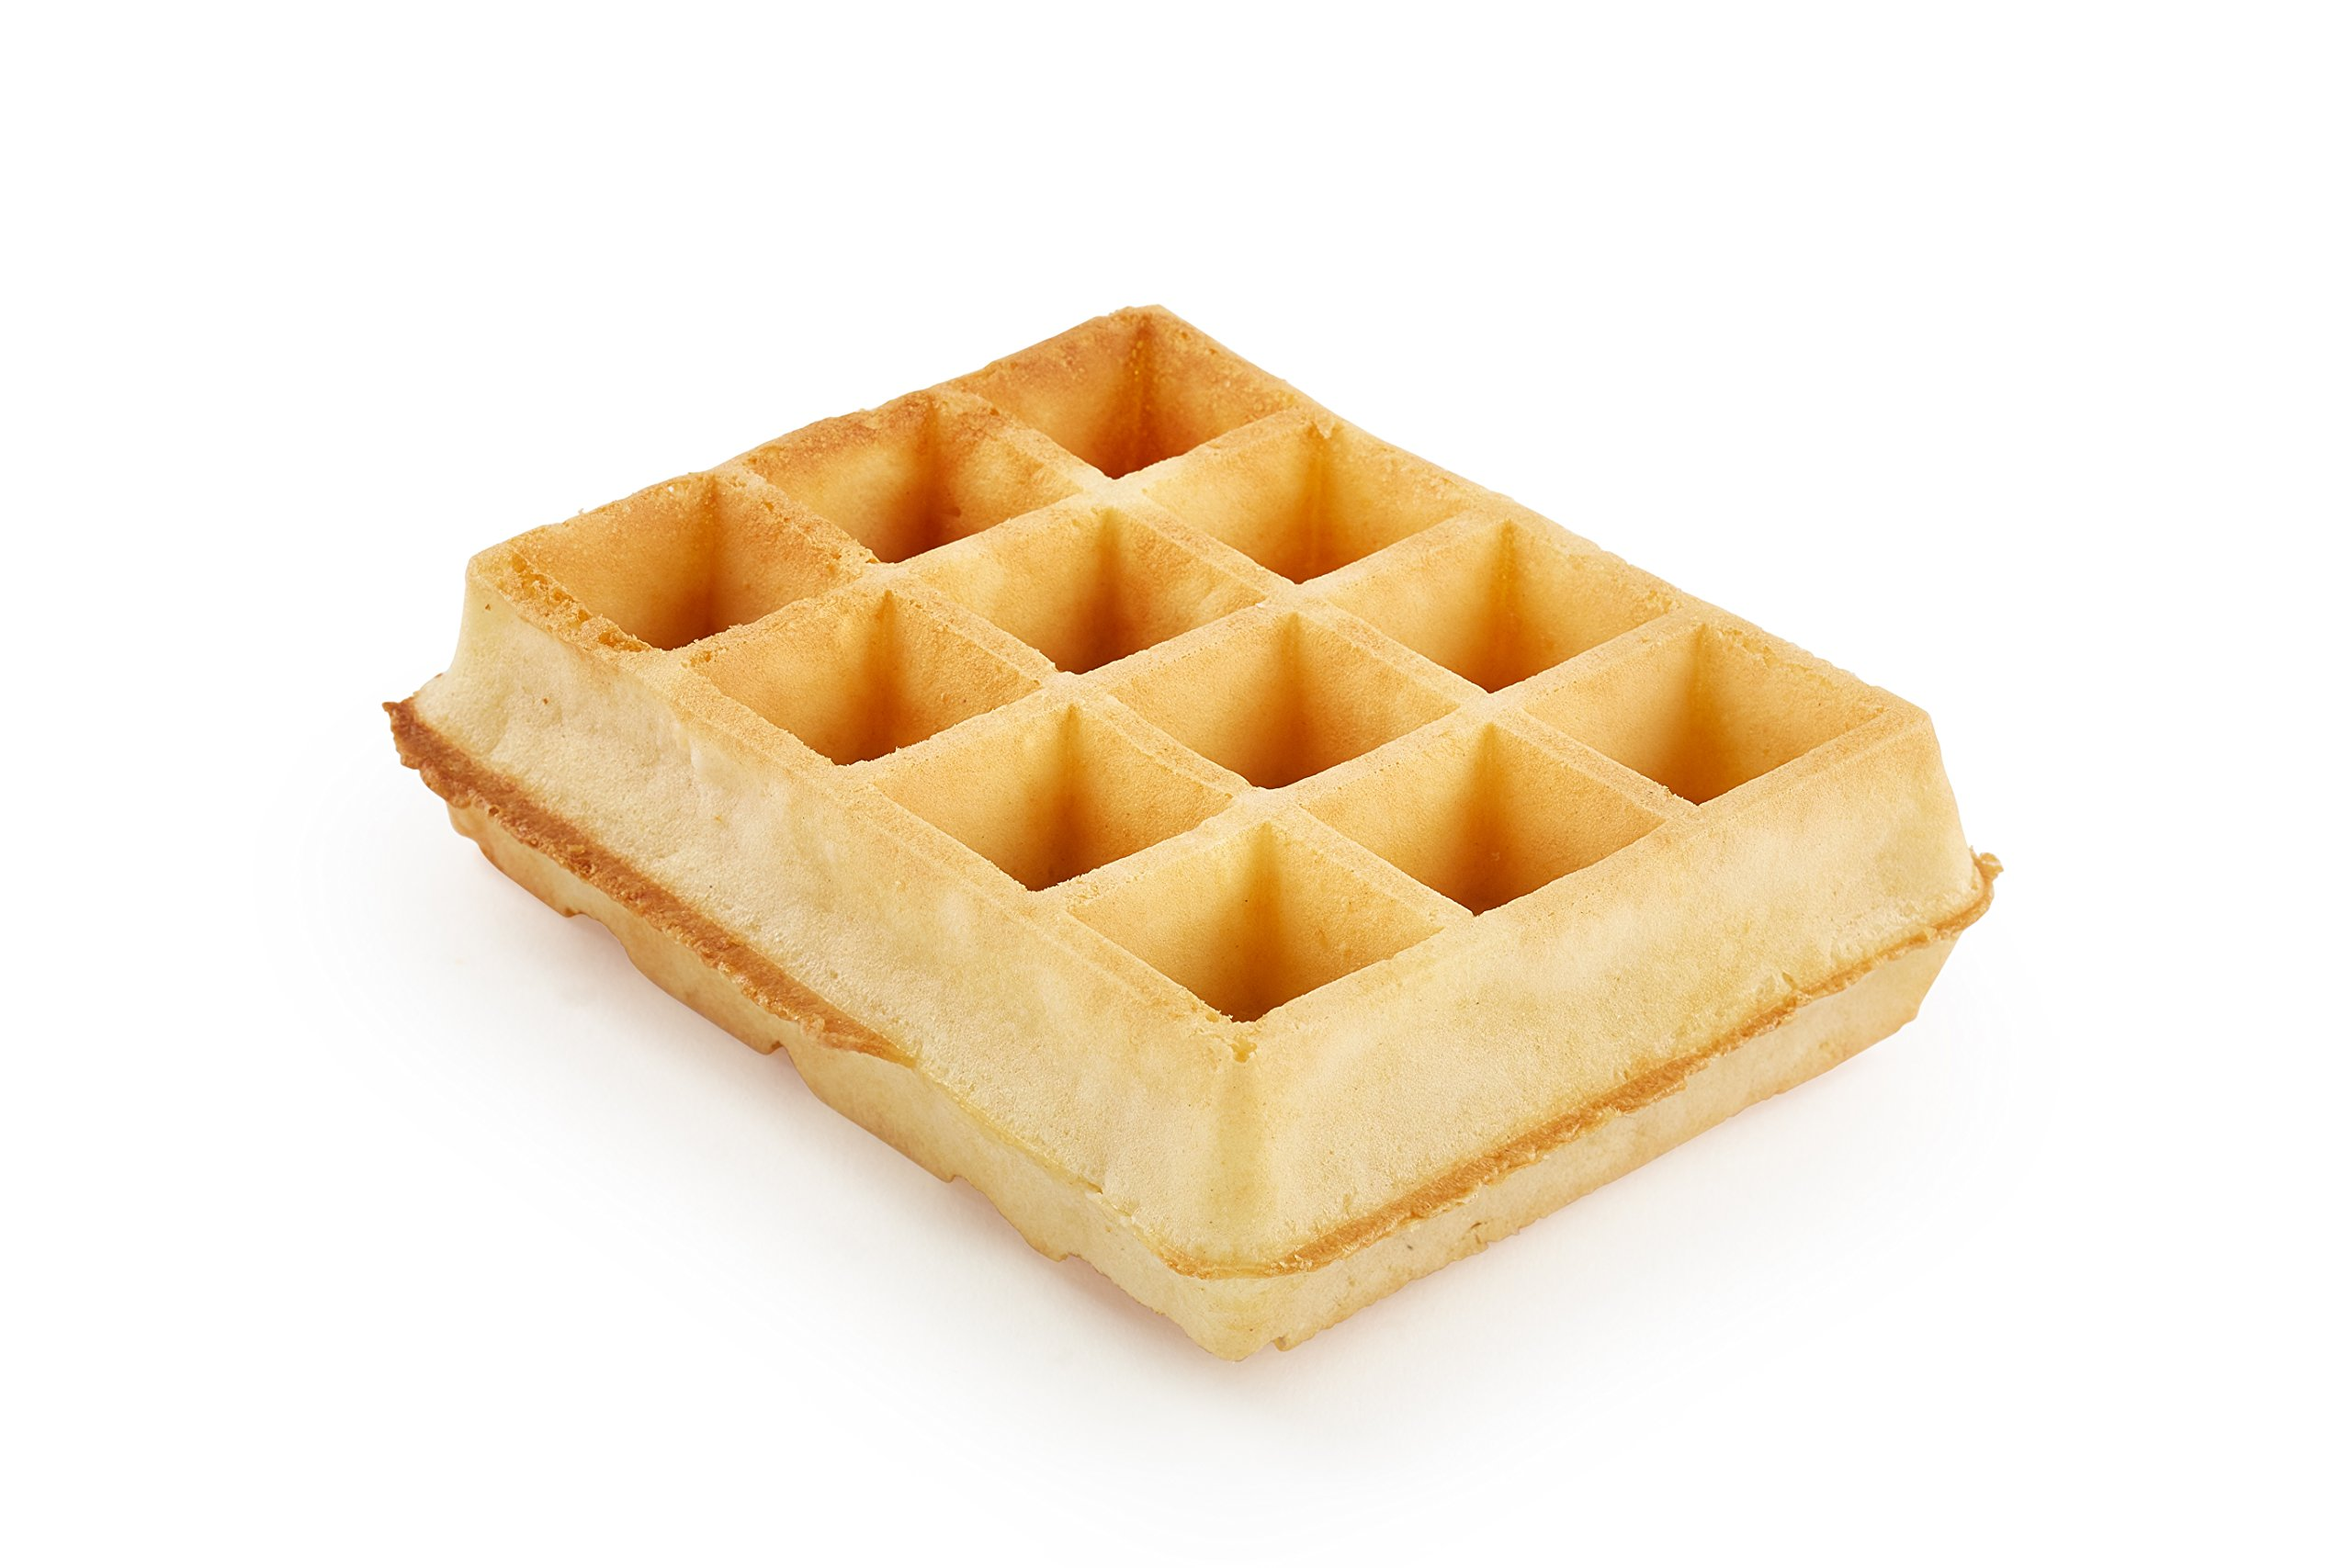 Avieta Brussels Waffles, 1.59 oz., (48 per case)